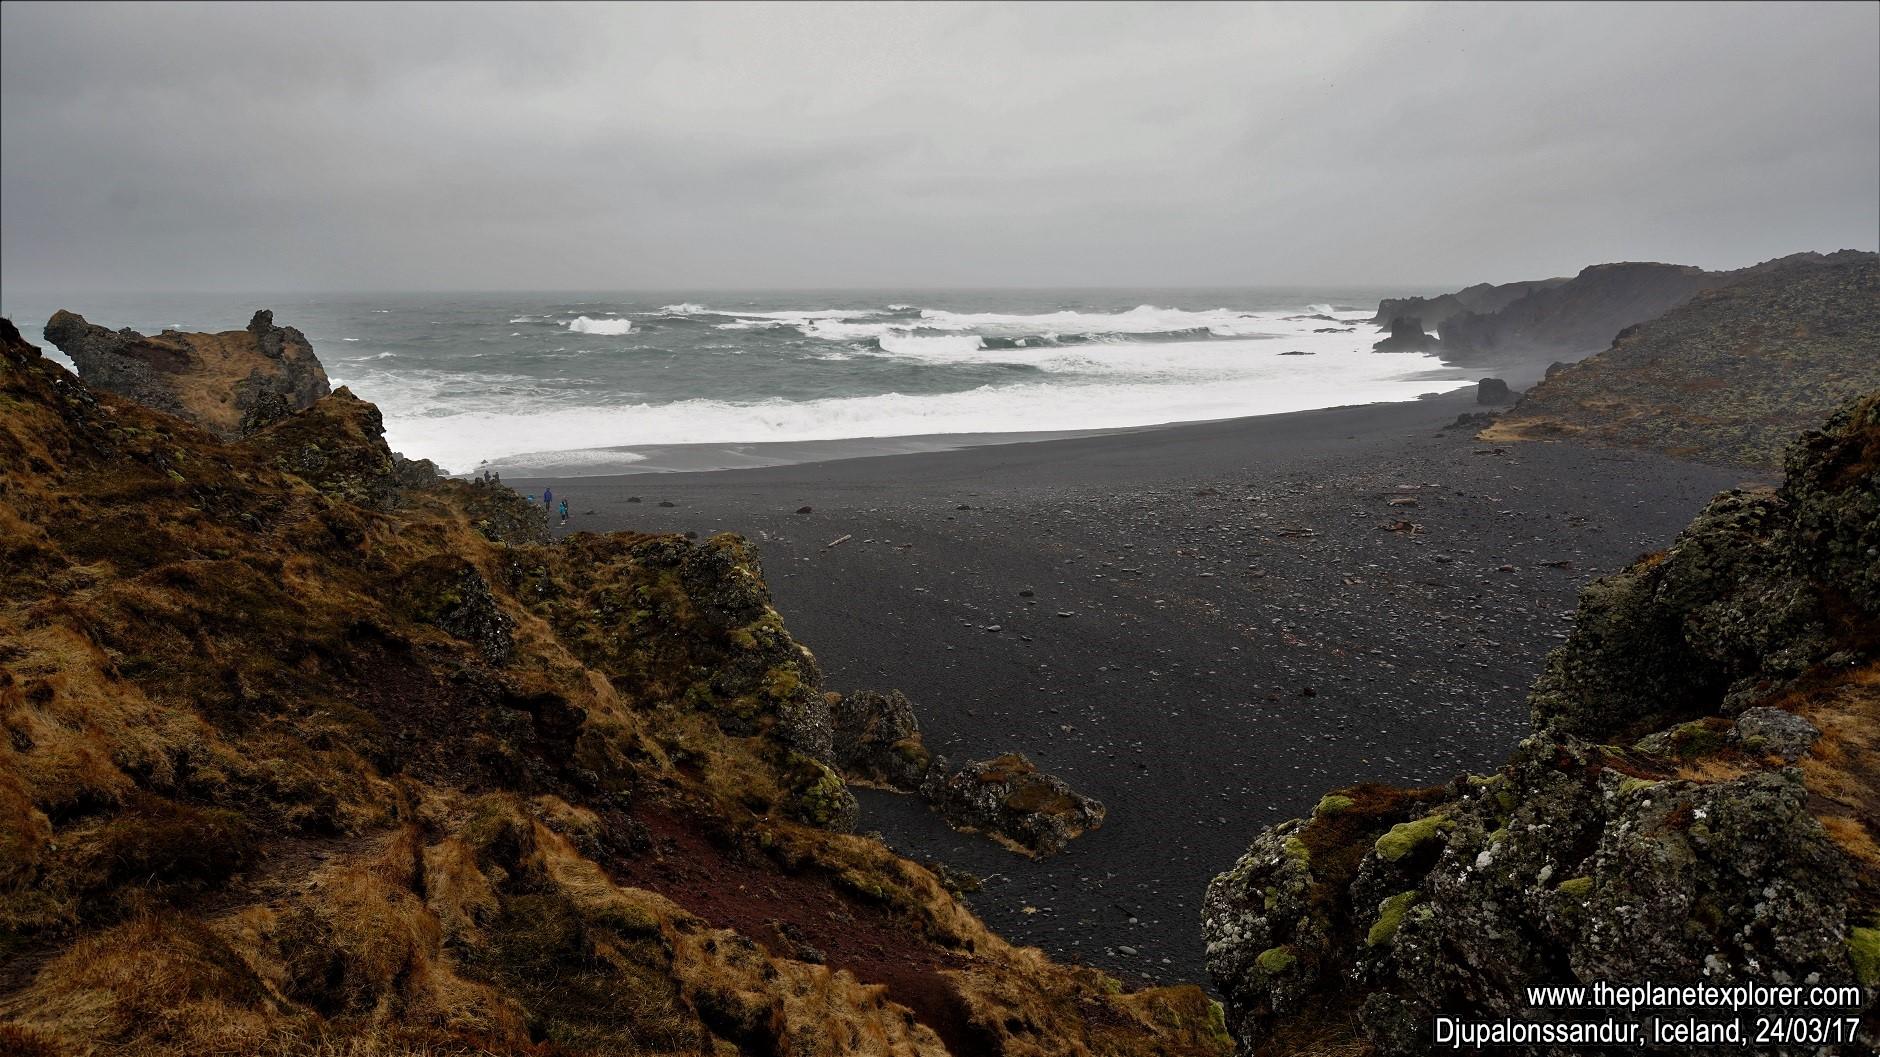 2017-03-24_1525_Iceland_Djupalonssandur_DSC02955_s7R2_LR_@www